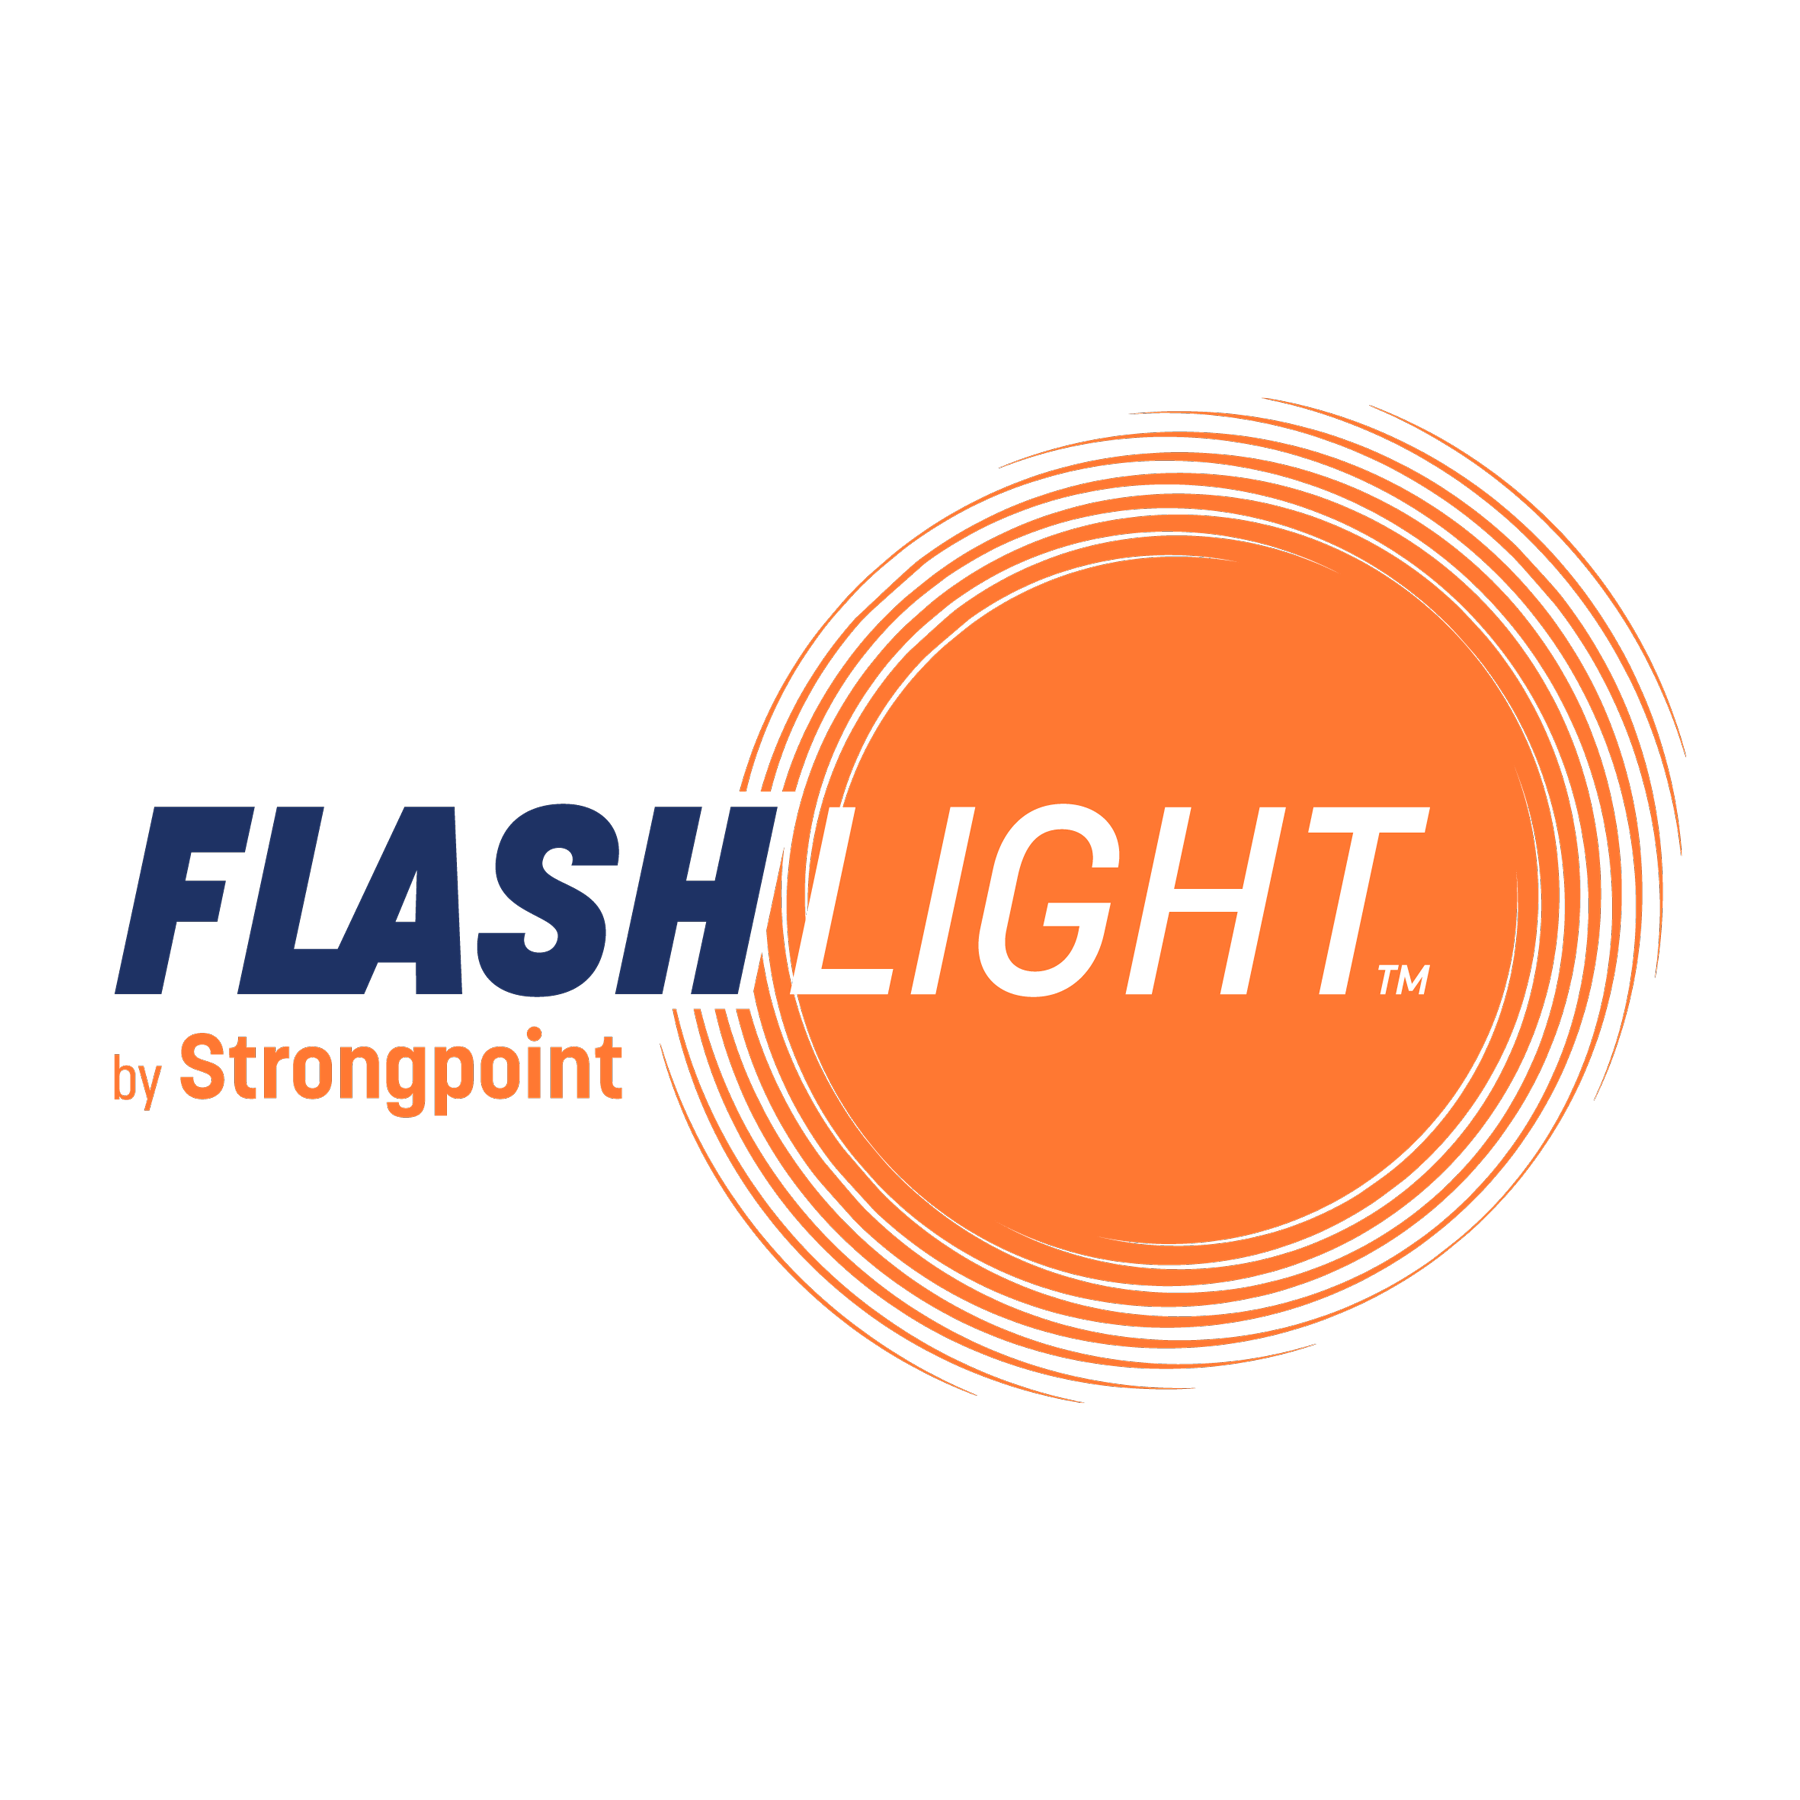 FLASHLIGHT-LOGOS_bicolor.png